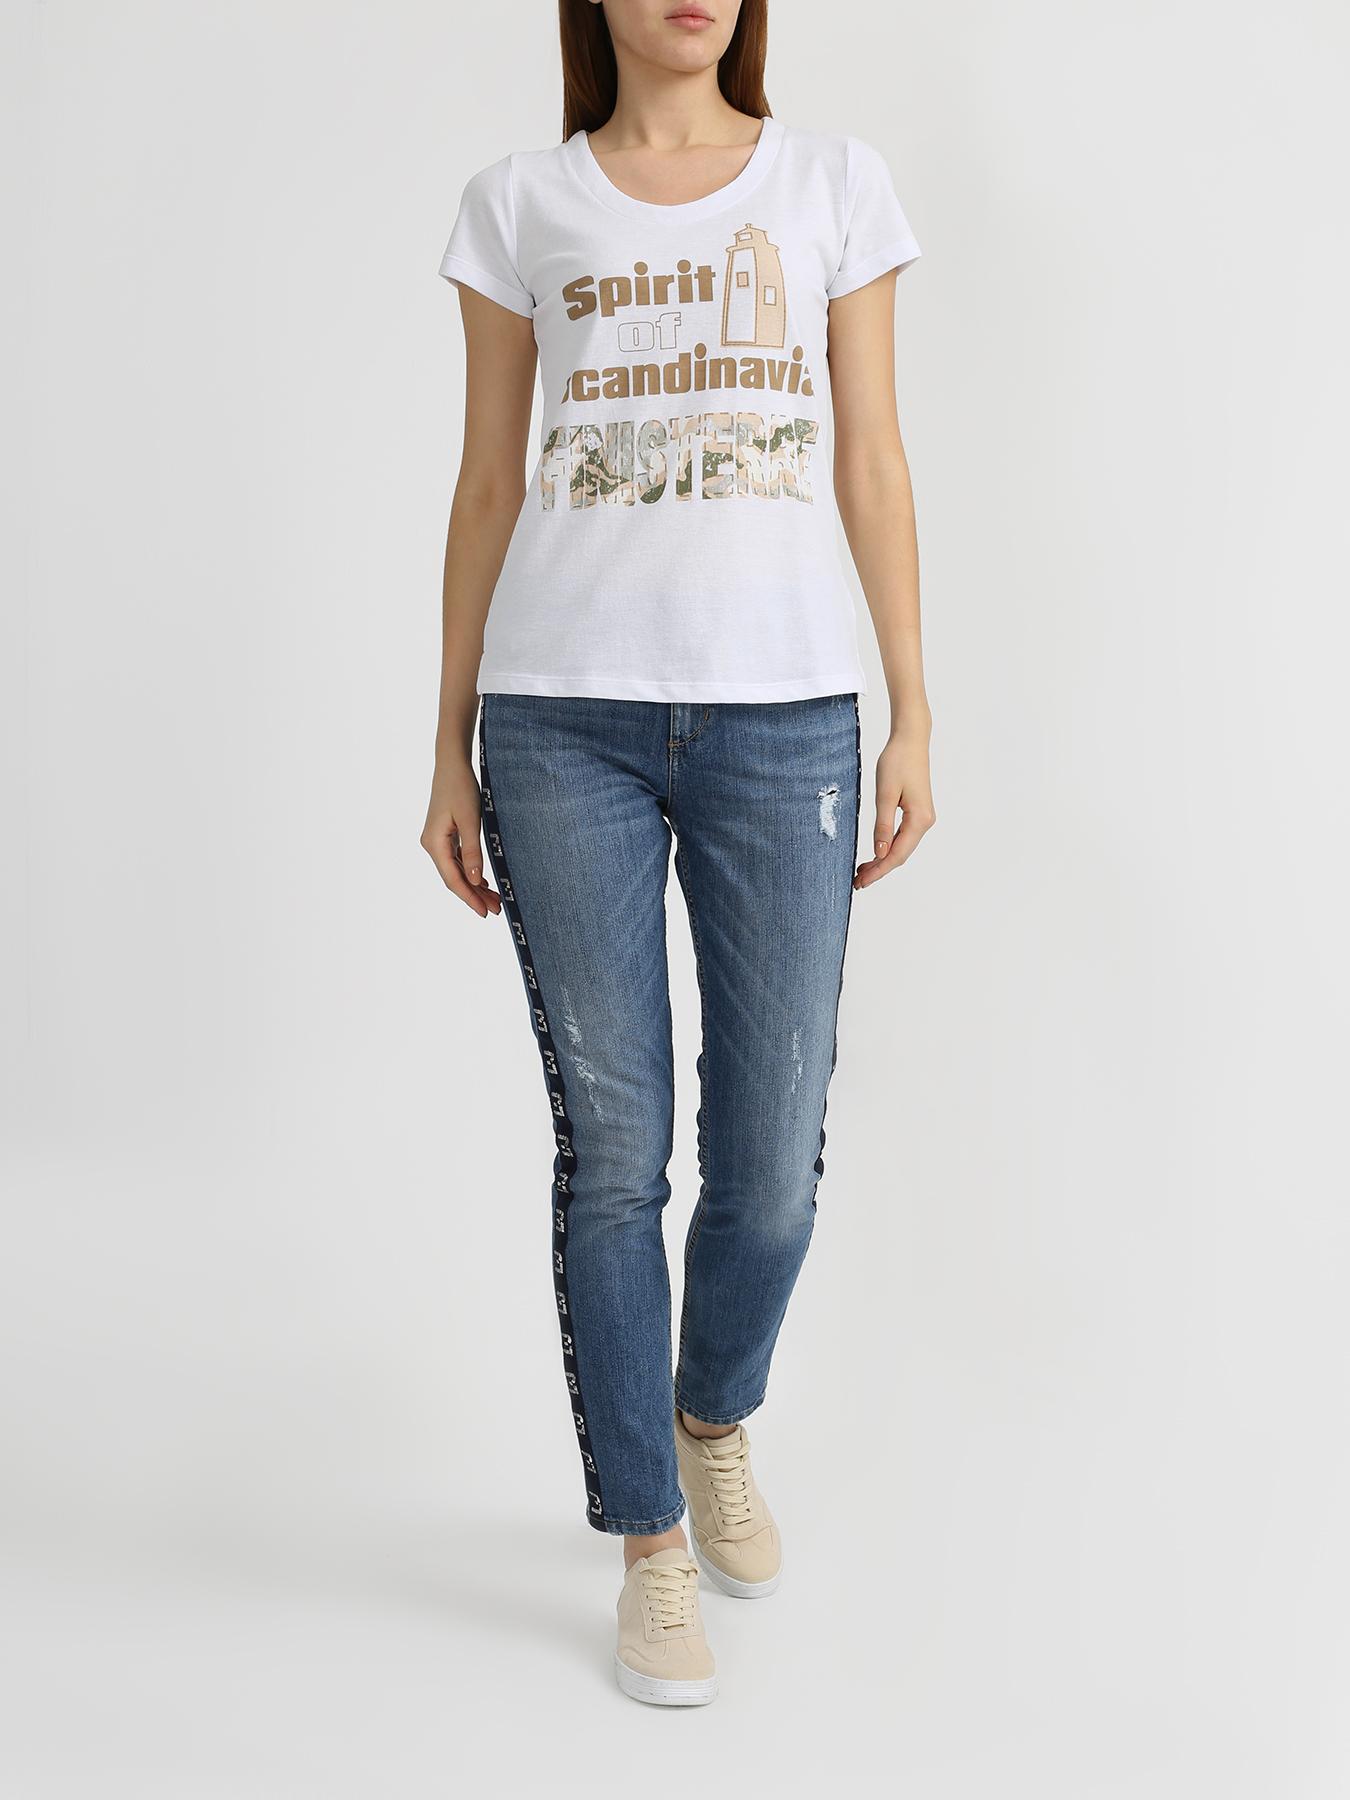 Finisterre Женская футболка фото